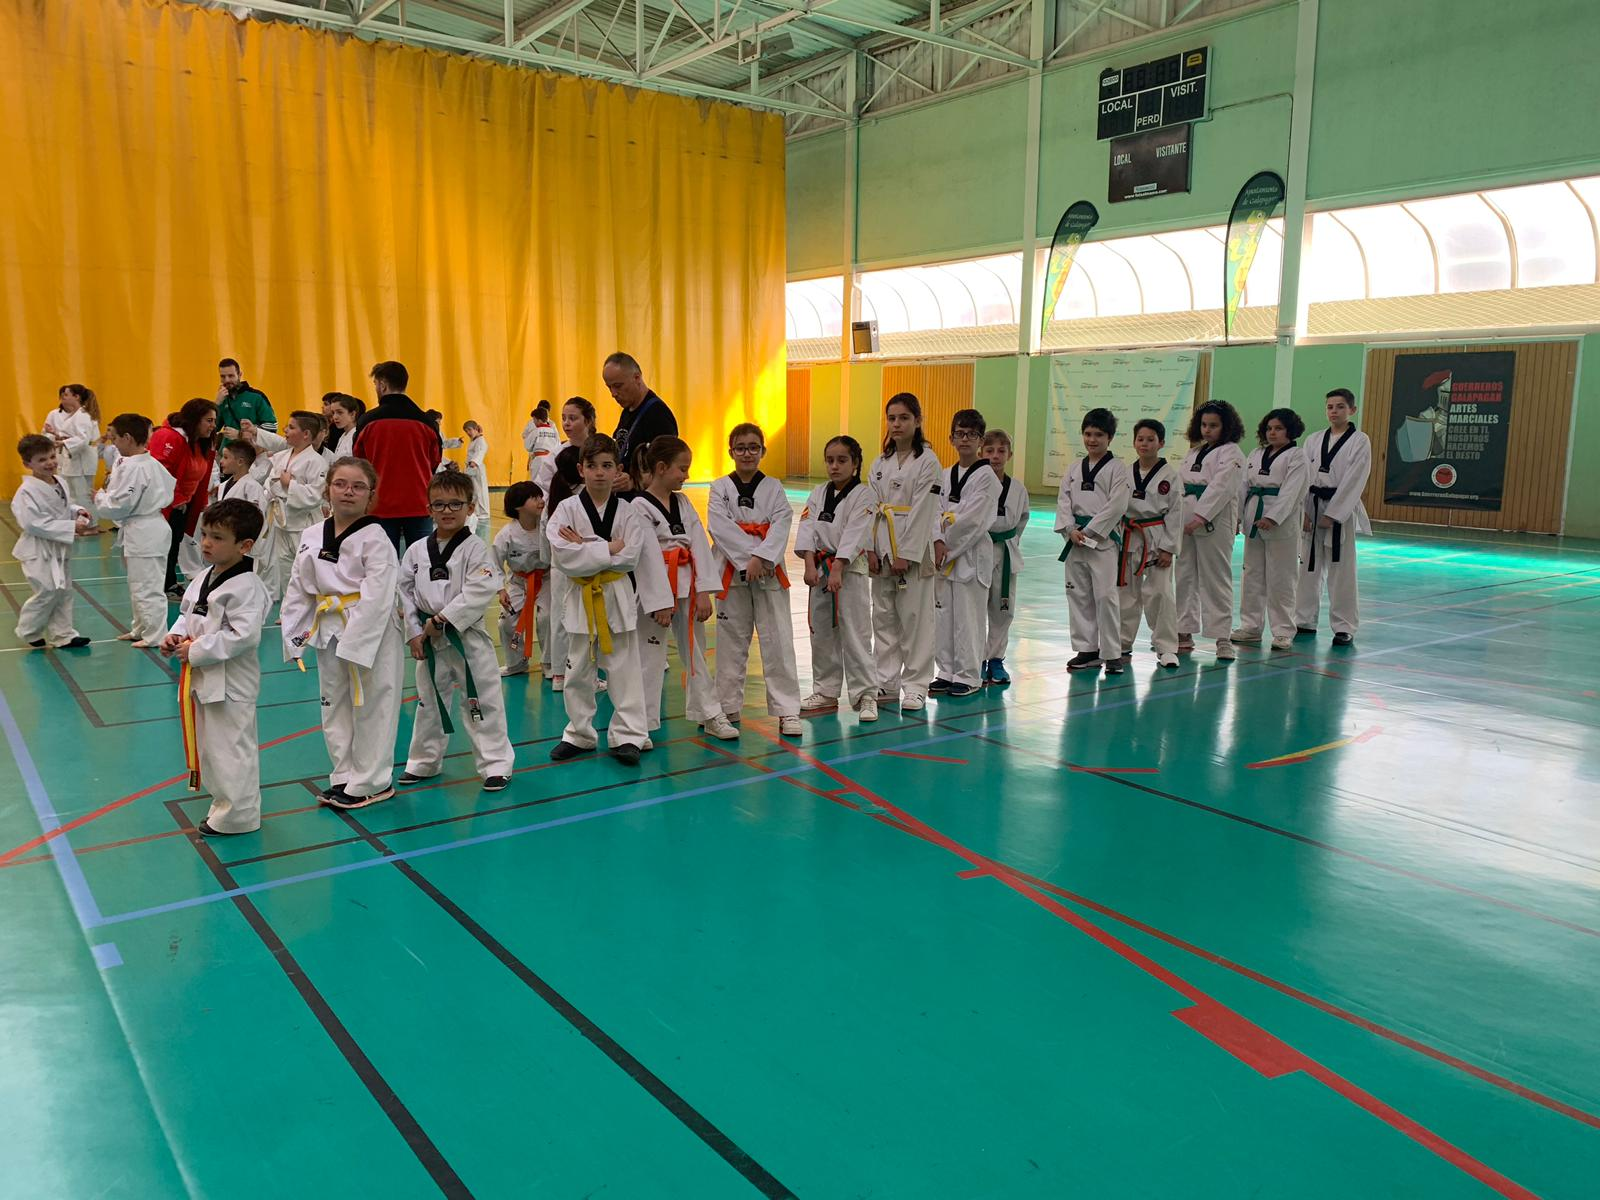 Veinte deportistas segovianos participan en el VI Open de Técnica de Taekwondo no competitivo de Galapagar